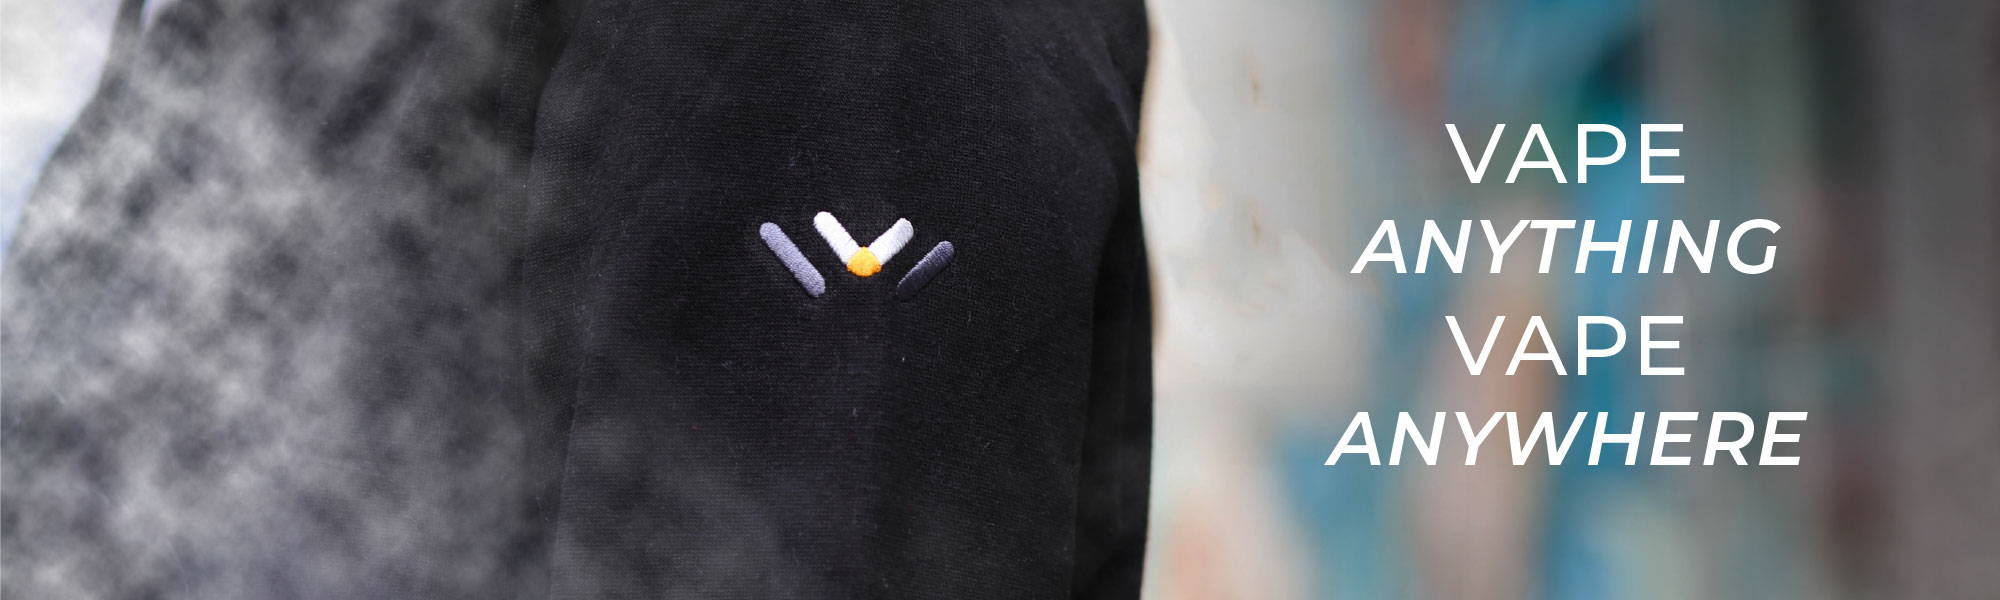 Vaprwear Gear, LLC: A Denver-based company